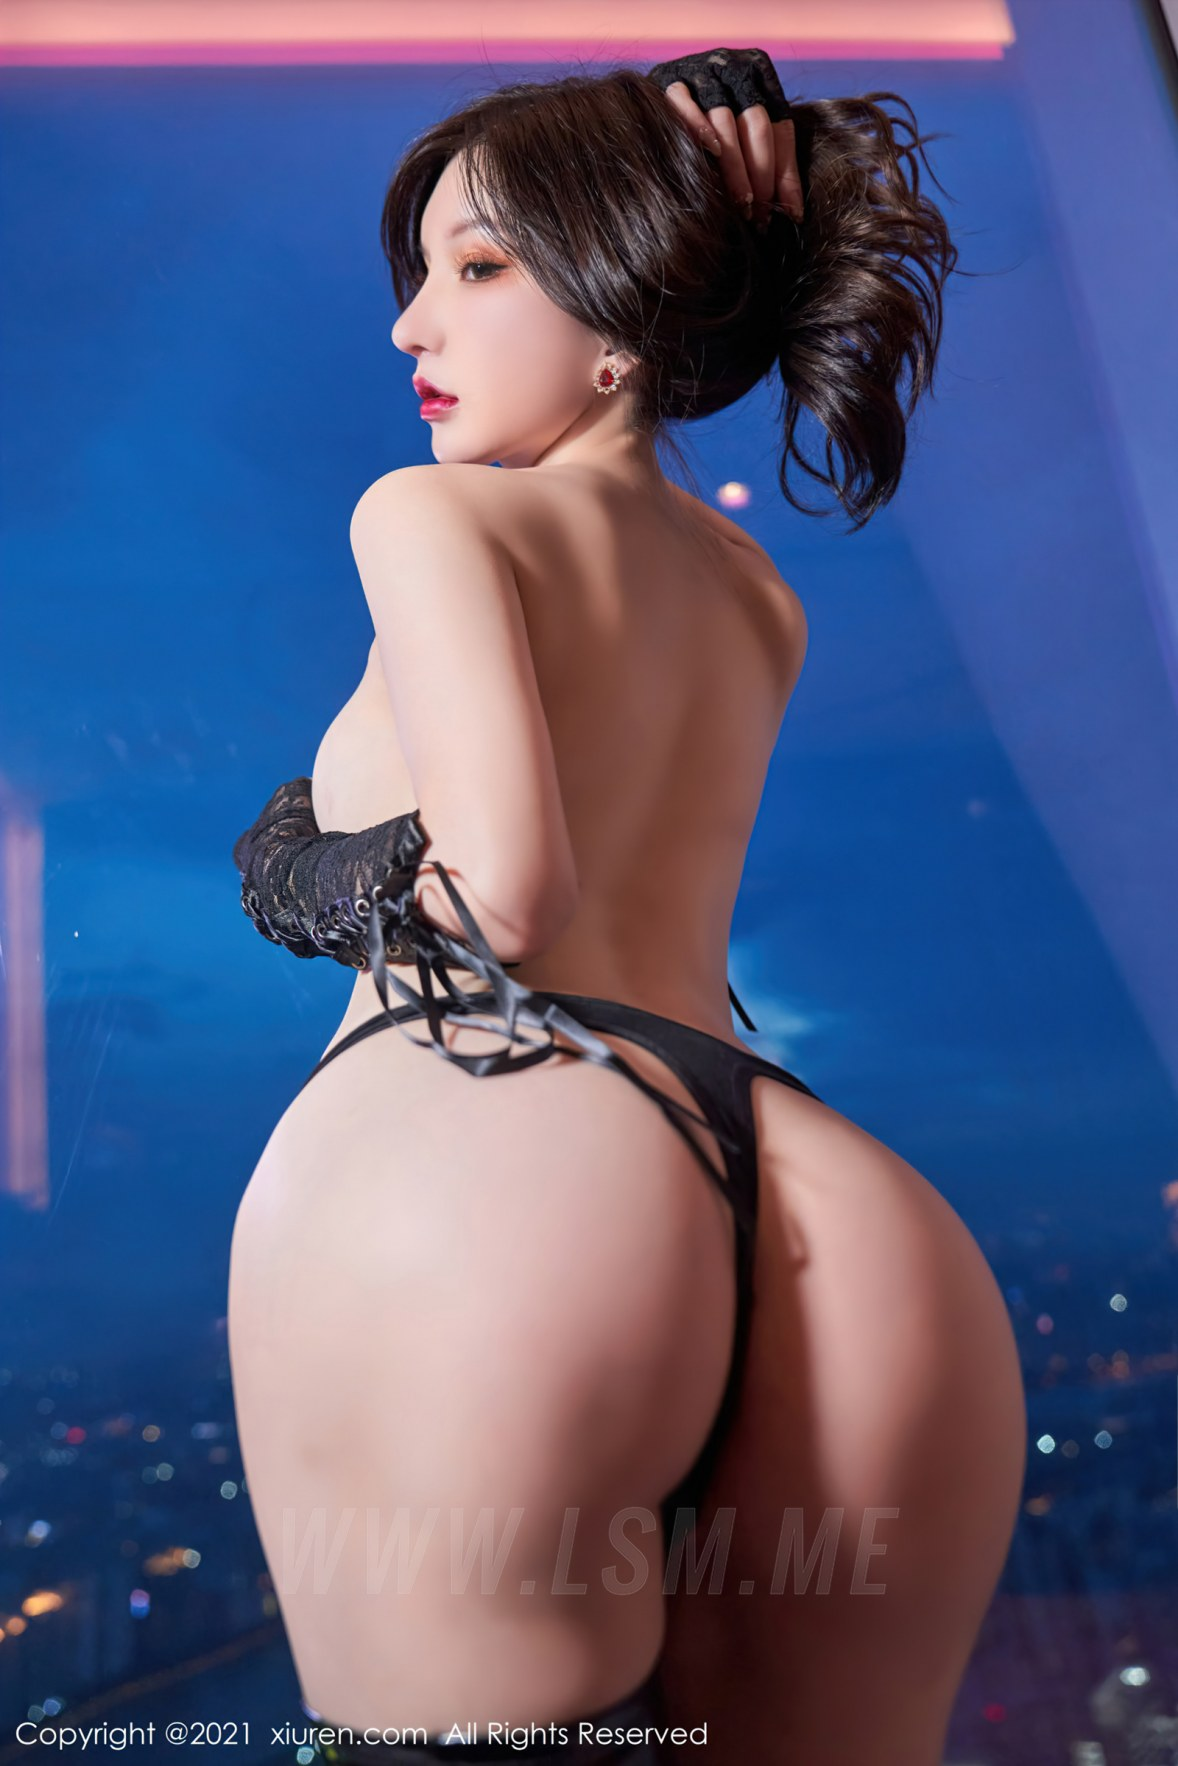 3799 054 ttg 3603 5400 - XiuRen 秀人 No.3799 黑色皮衣 周于希Sandy  - 秀人网 【私房高清壁纸视频素材】【免费在线写真】【丽人丝语】